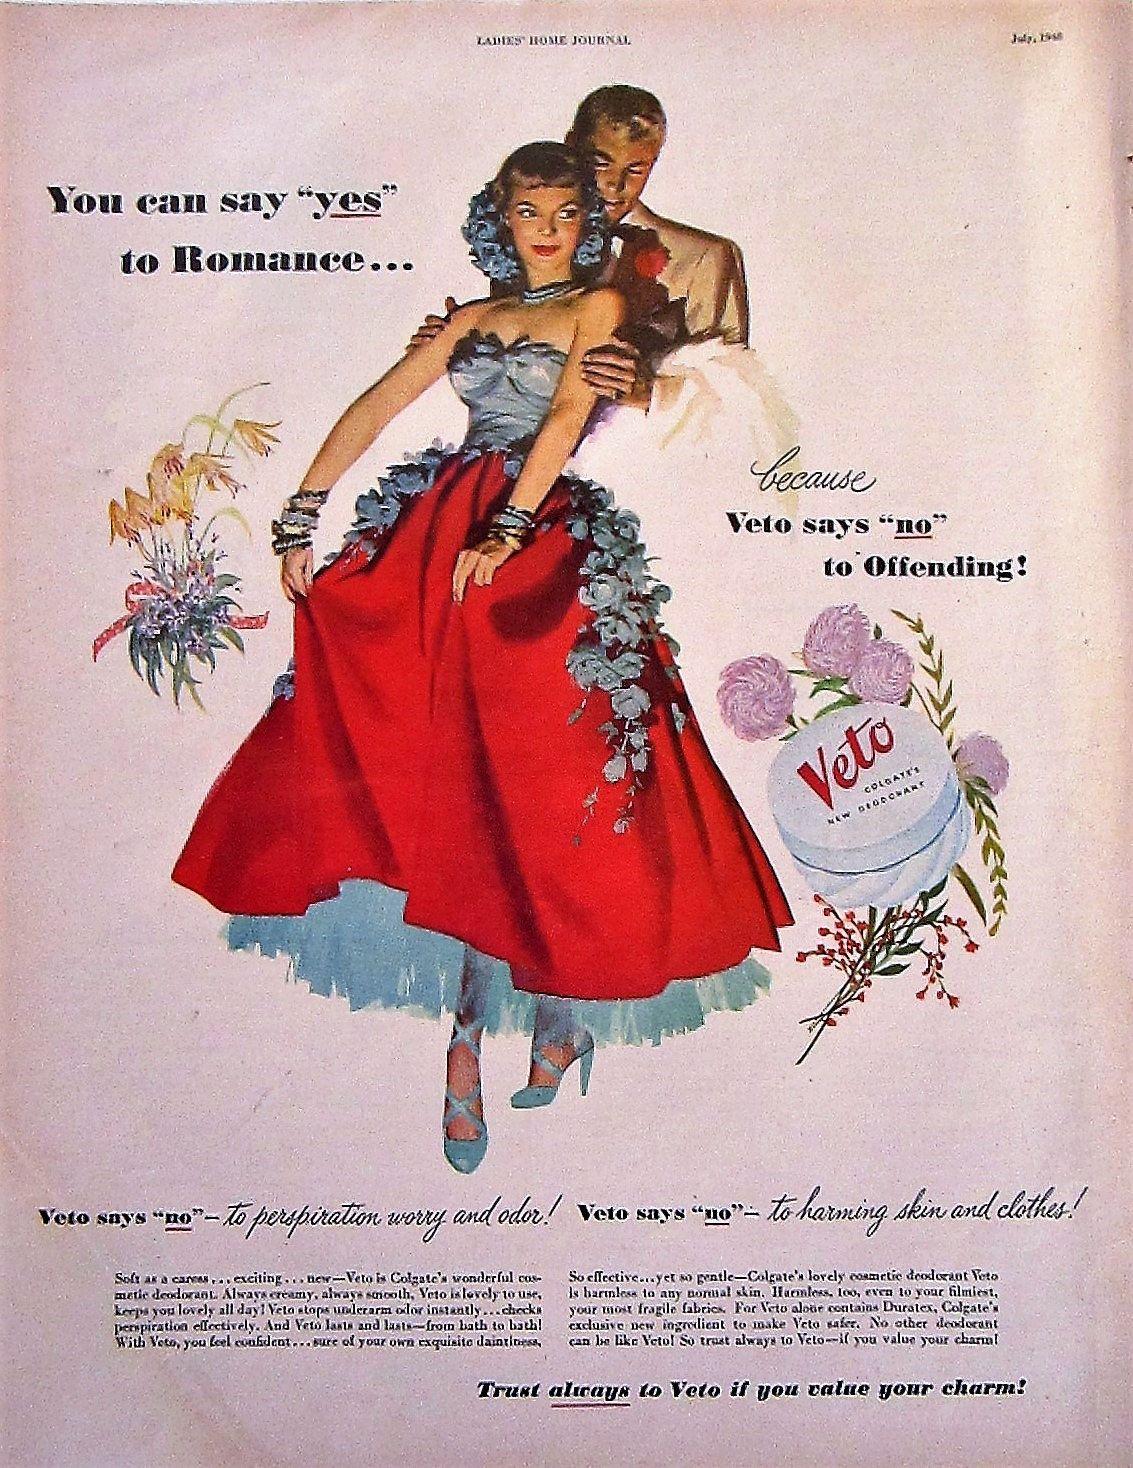 Vintage bathroom ads - 1948 Colgate Veto Deodorant Vintage Advertisement Bathroom Wall Art Powder Room Decor Original Magazine Print Ad Paper Ephemera